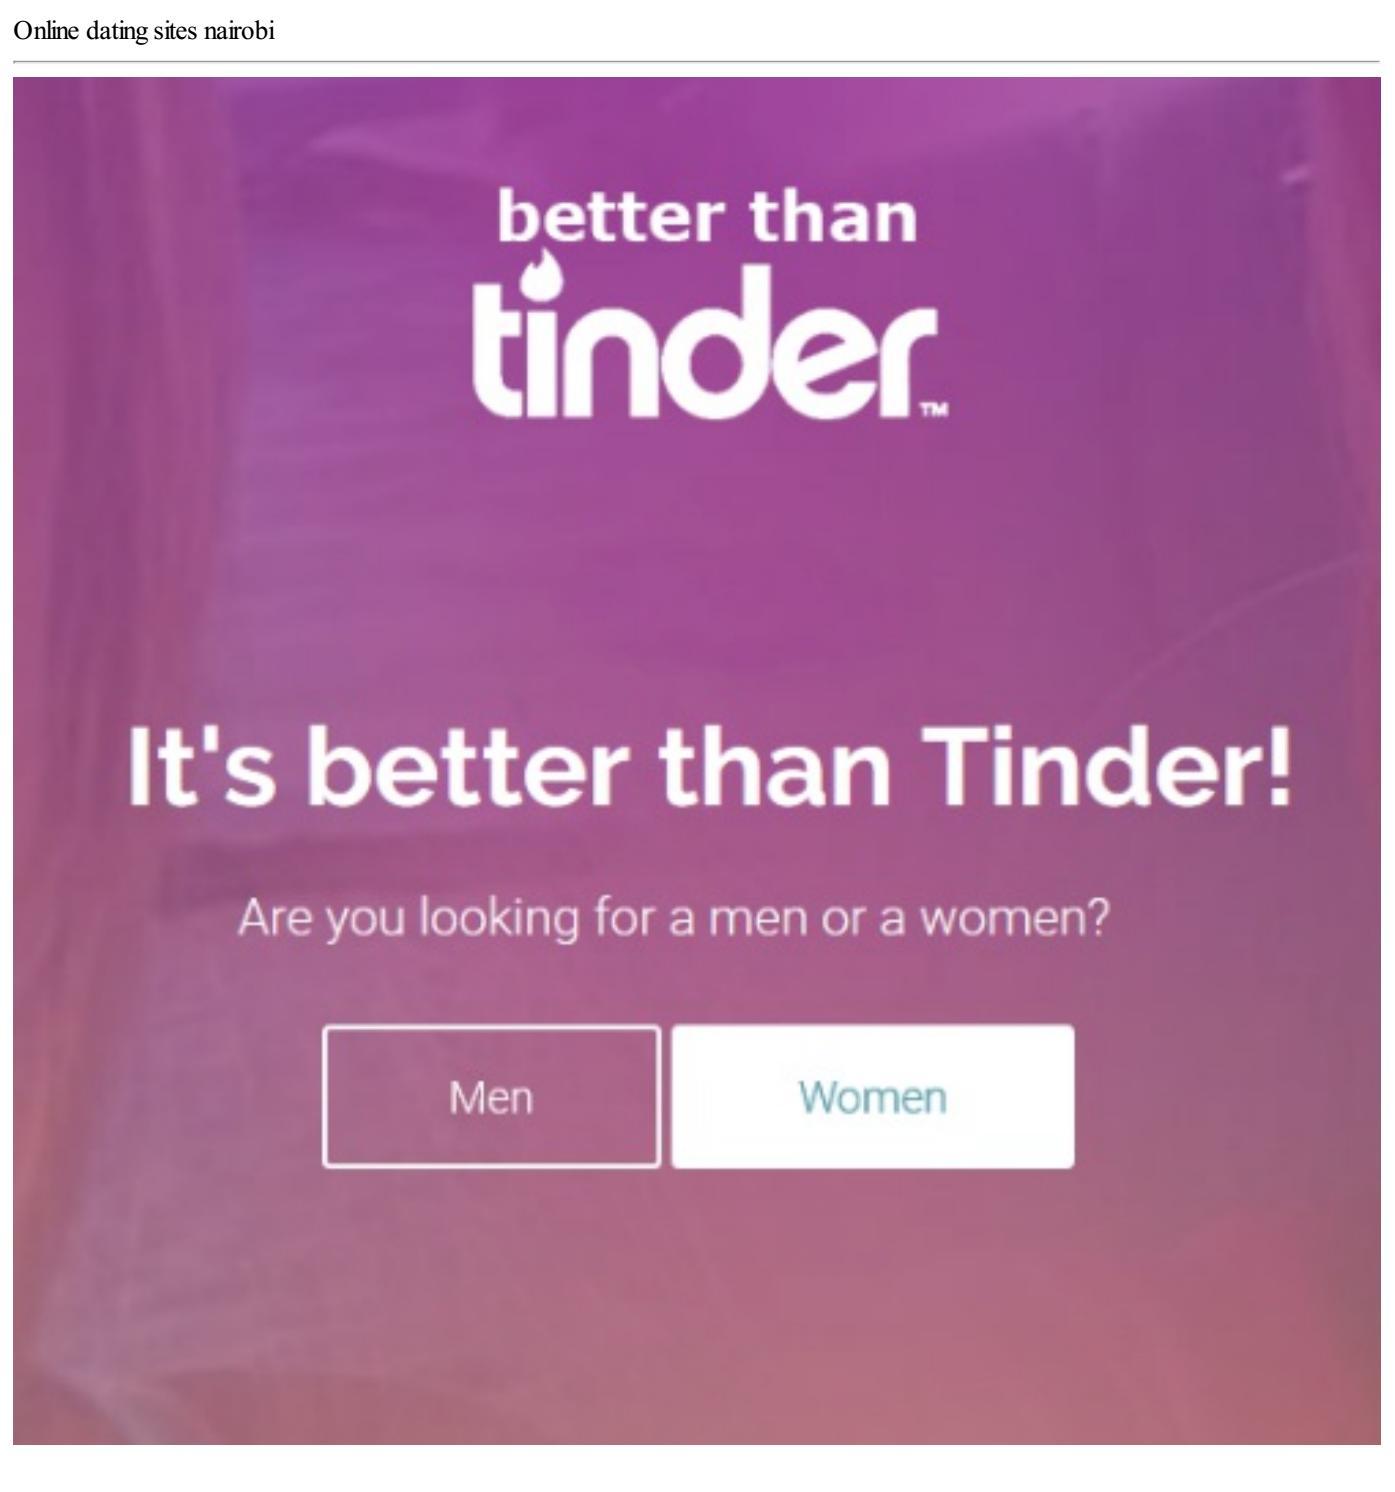 Dating sites voor Cubs fans